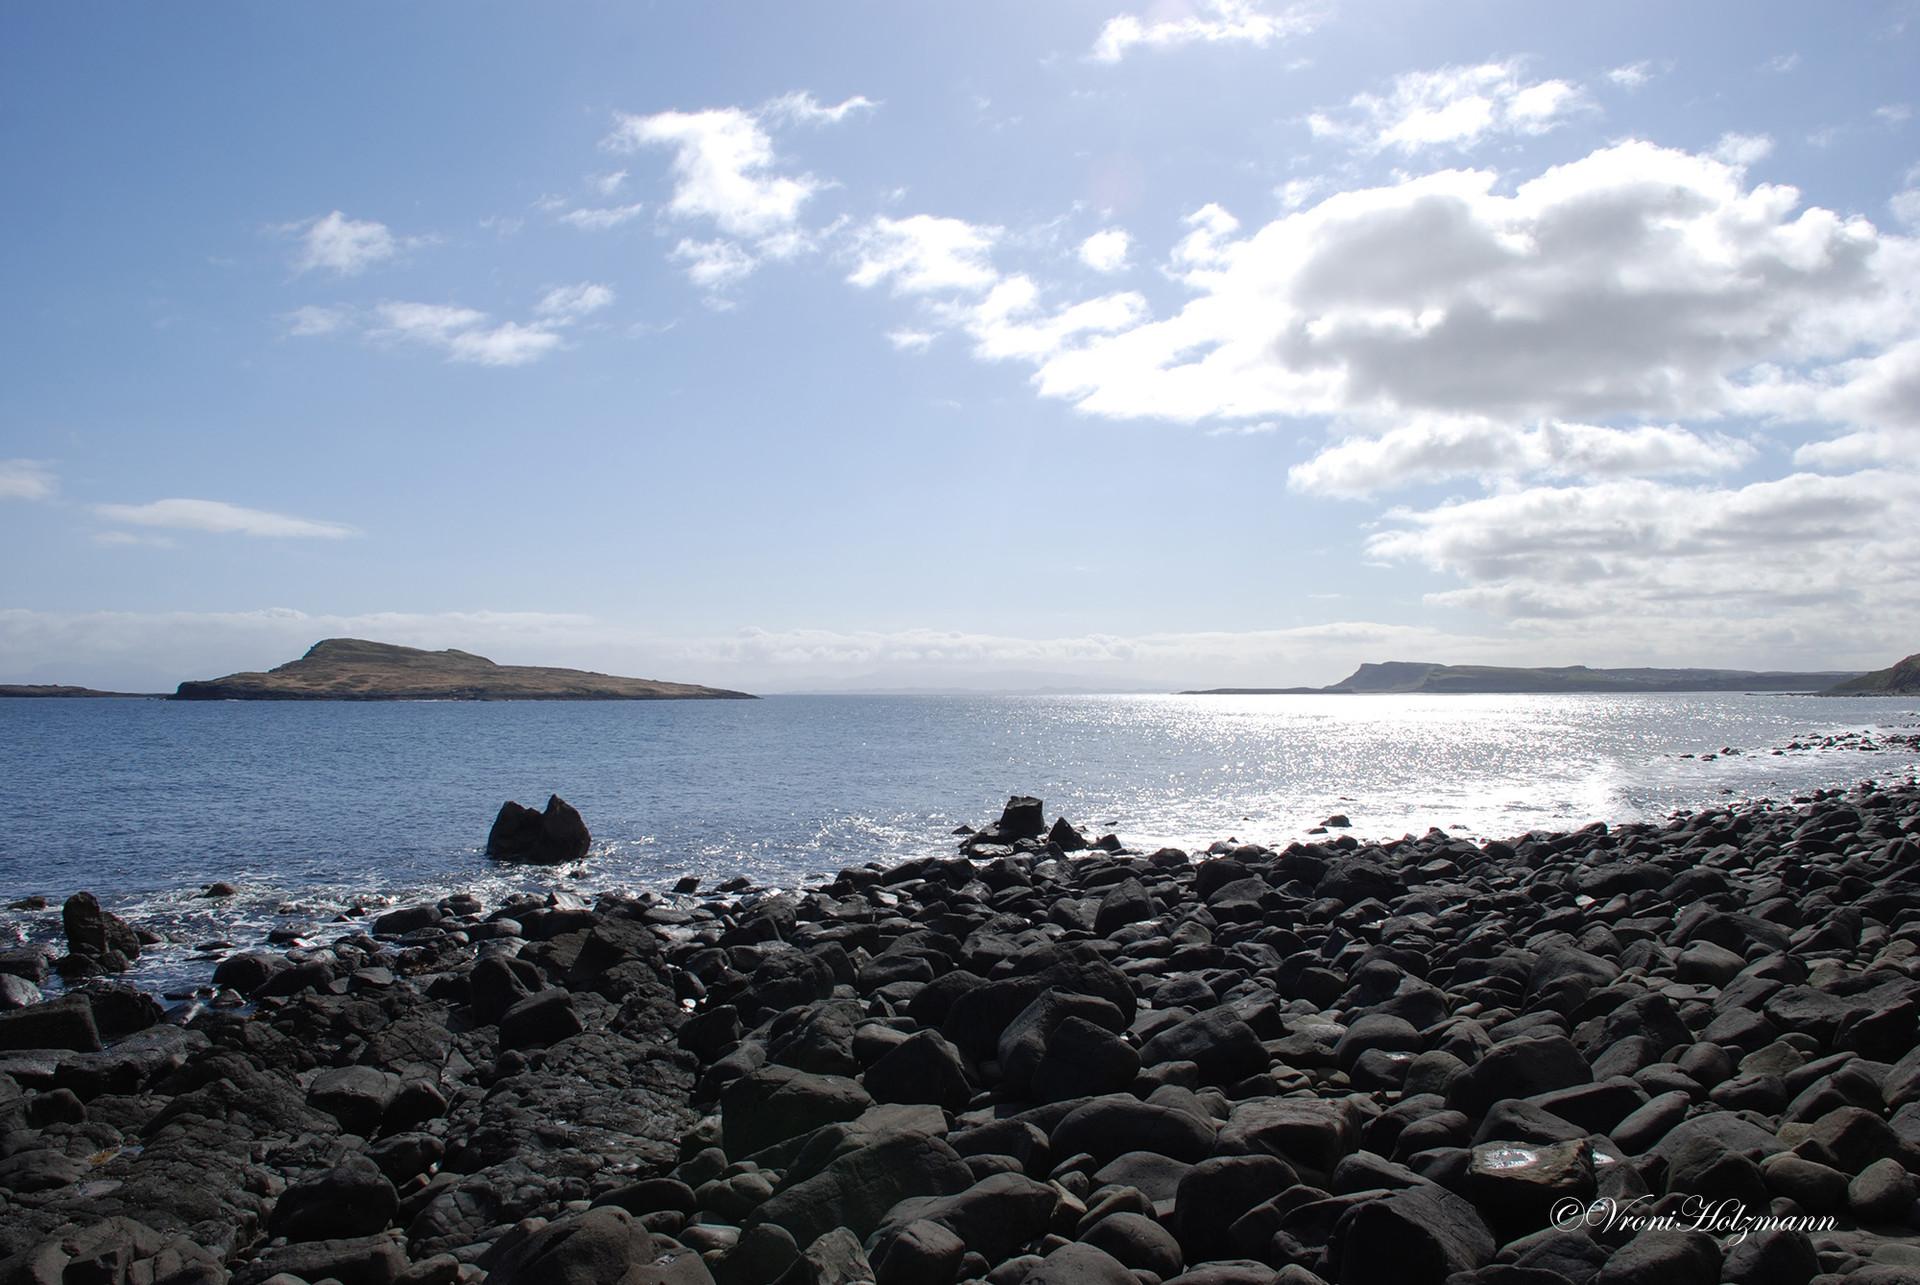 Stoney beach in the Hebrides